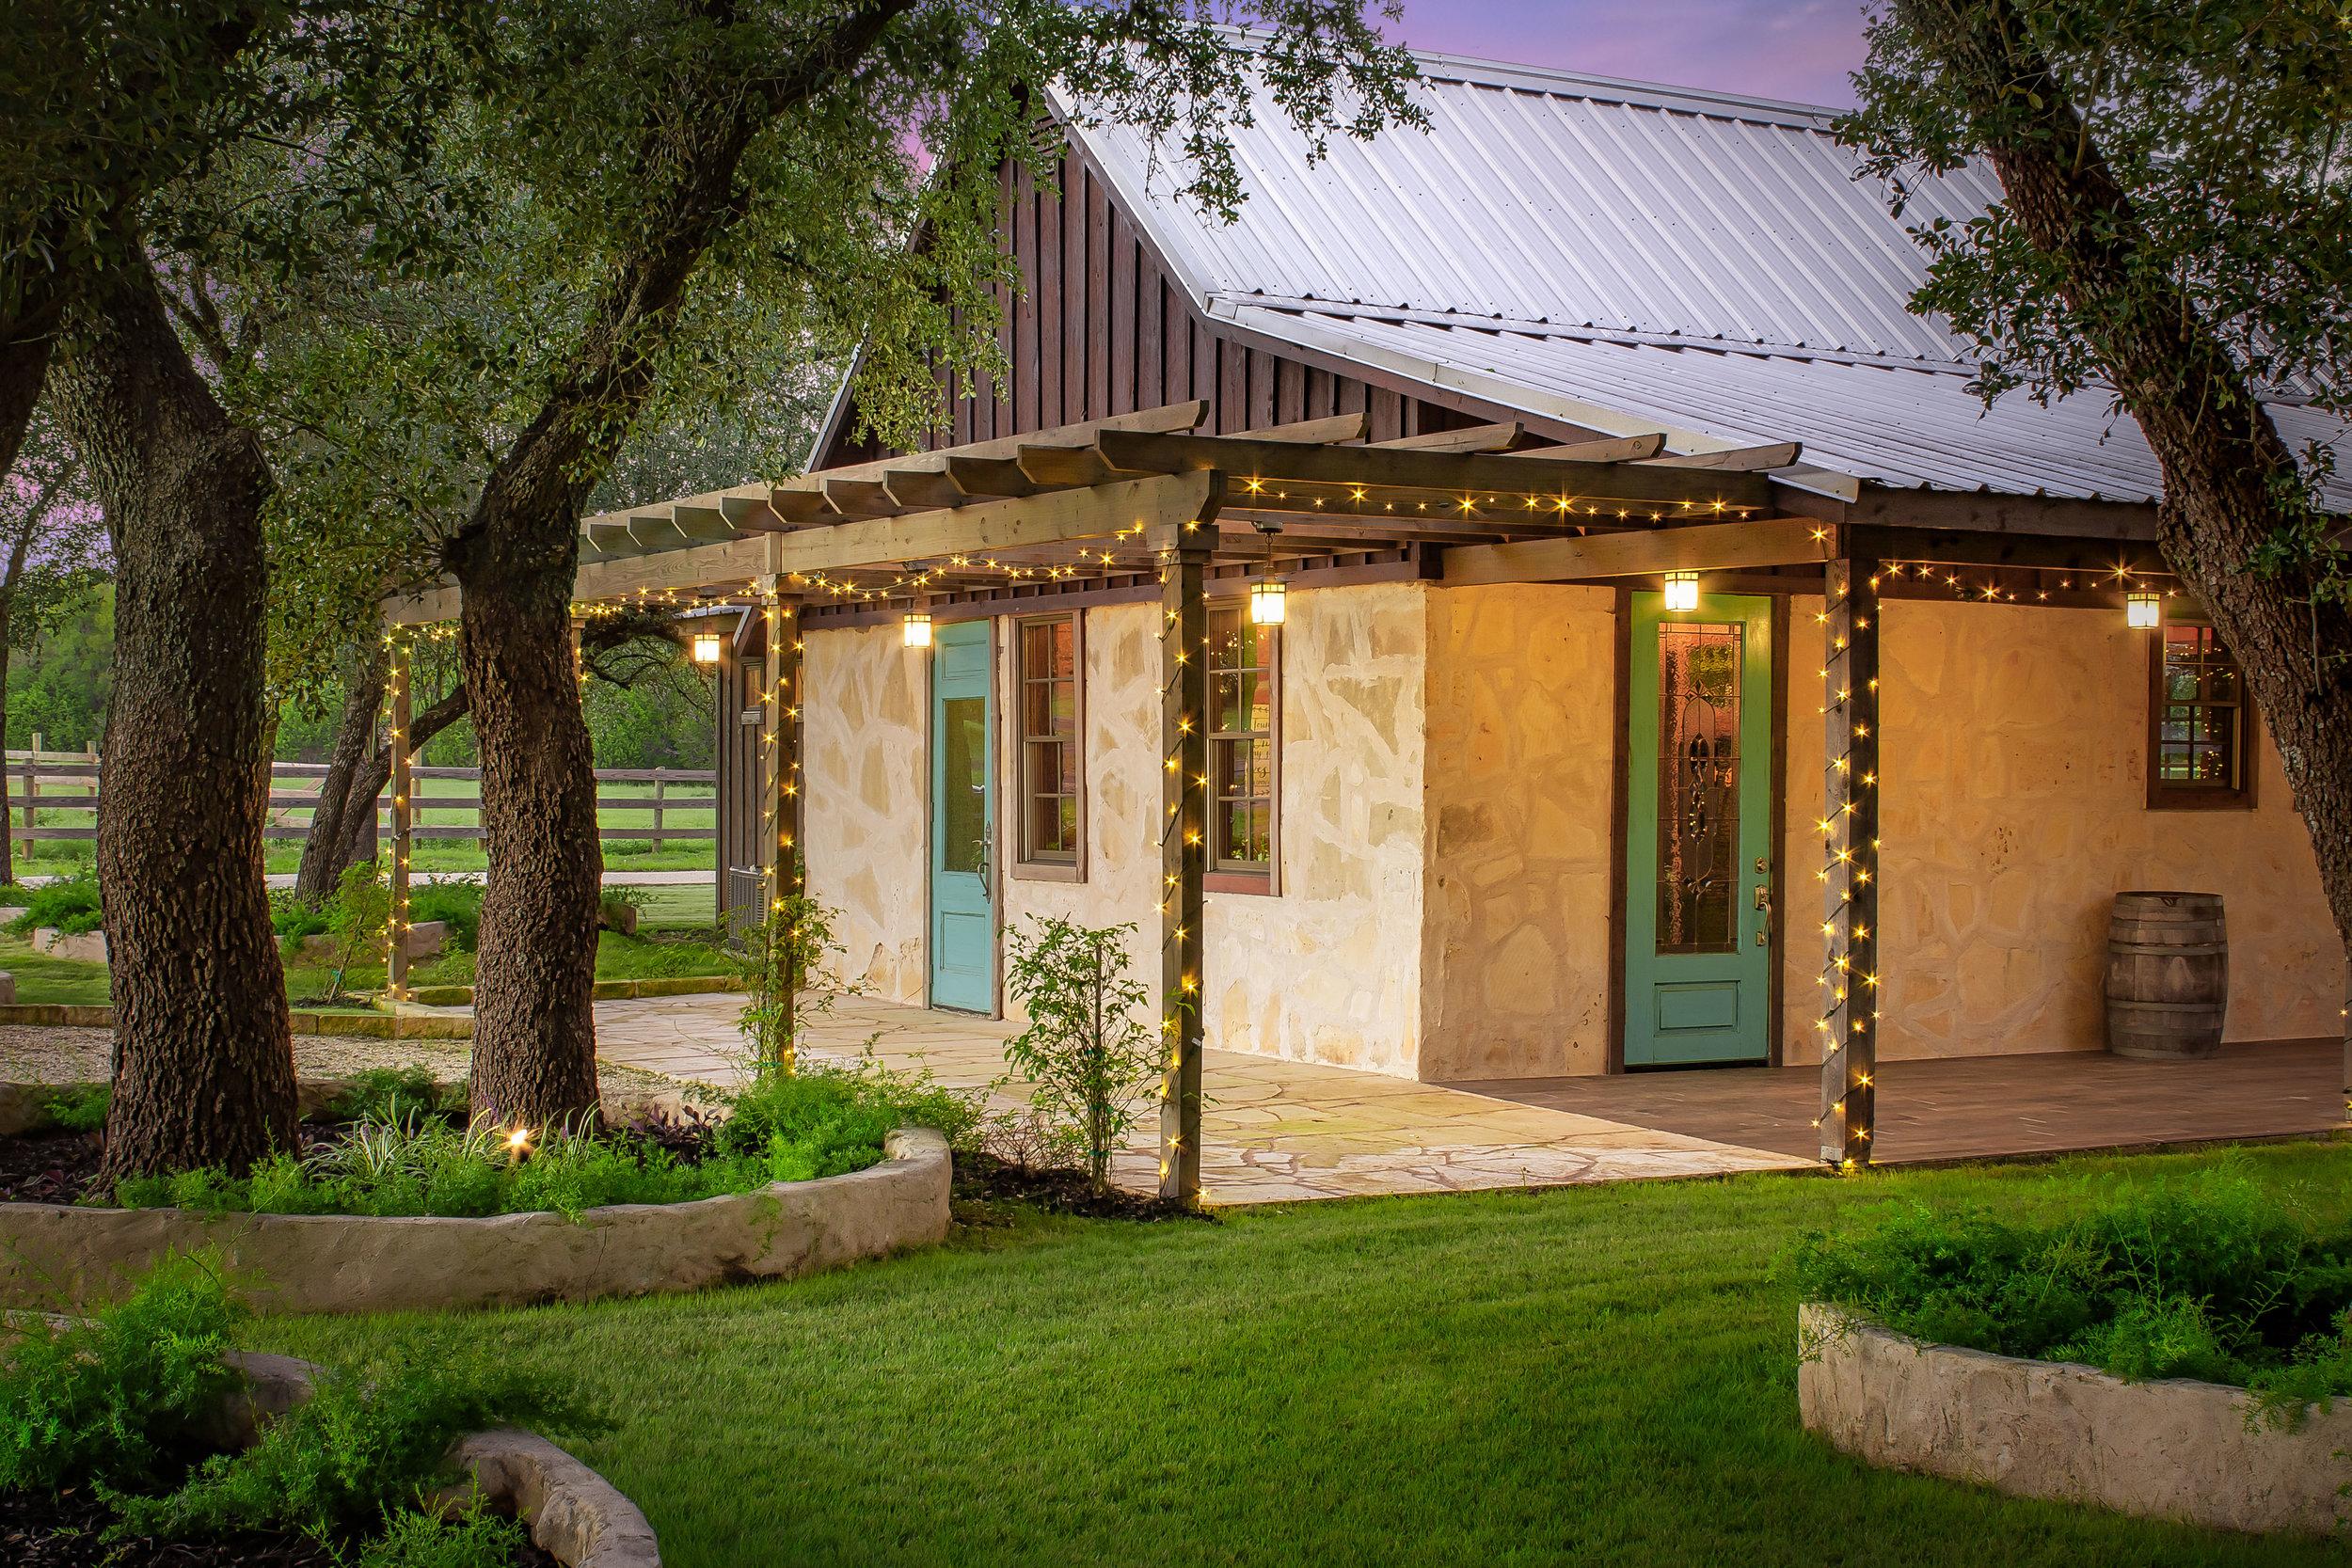 2018-08-31 Megan Parsons - Shooting Star Ranch (Screen-Res) (5 of 32).jpg